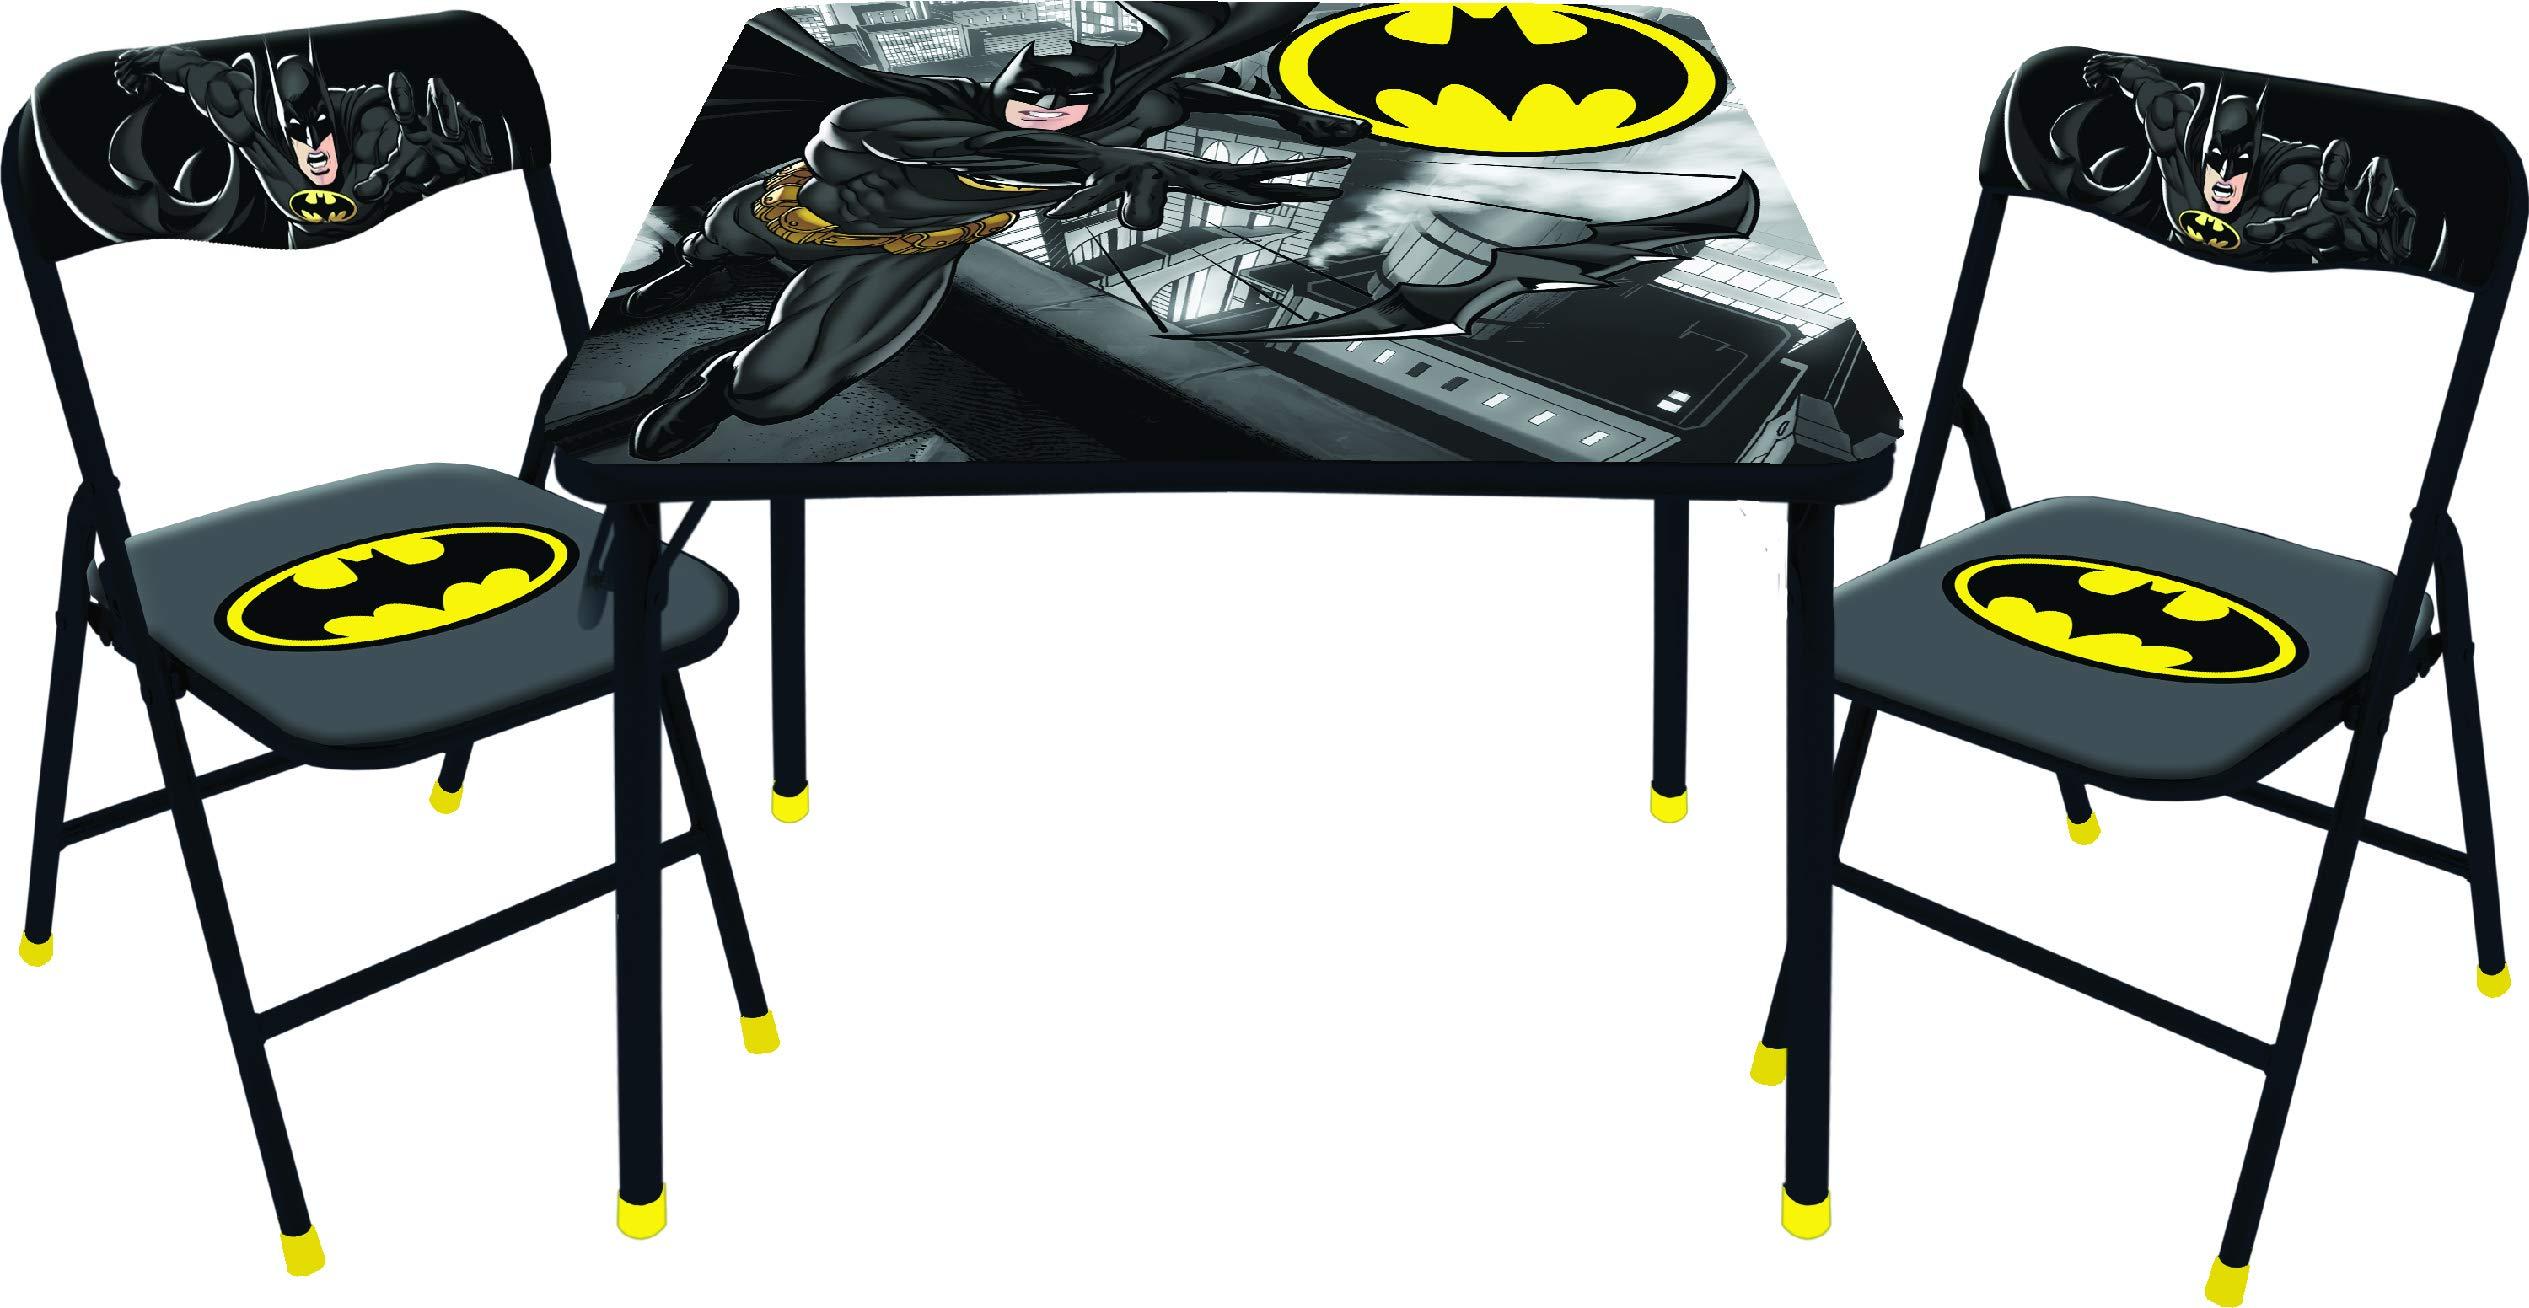 DC Comics Batman 3 Pc Table & Chair Set, Black by DC Comics